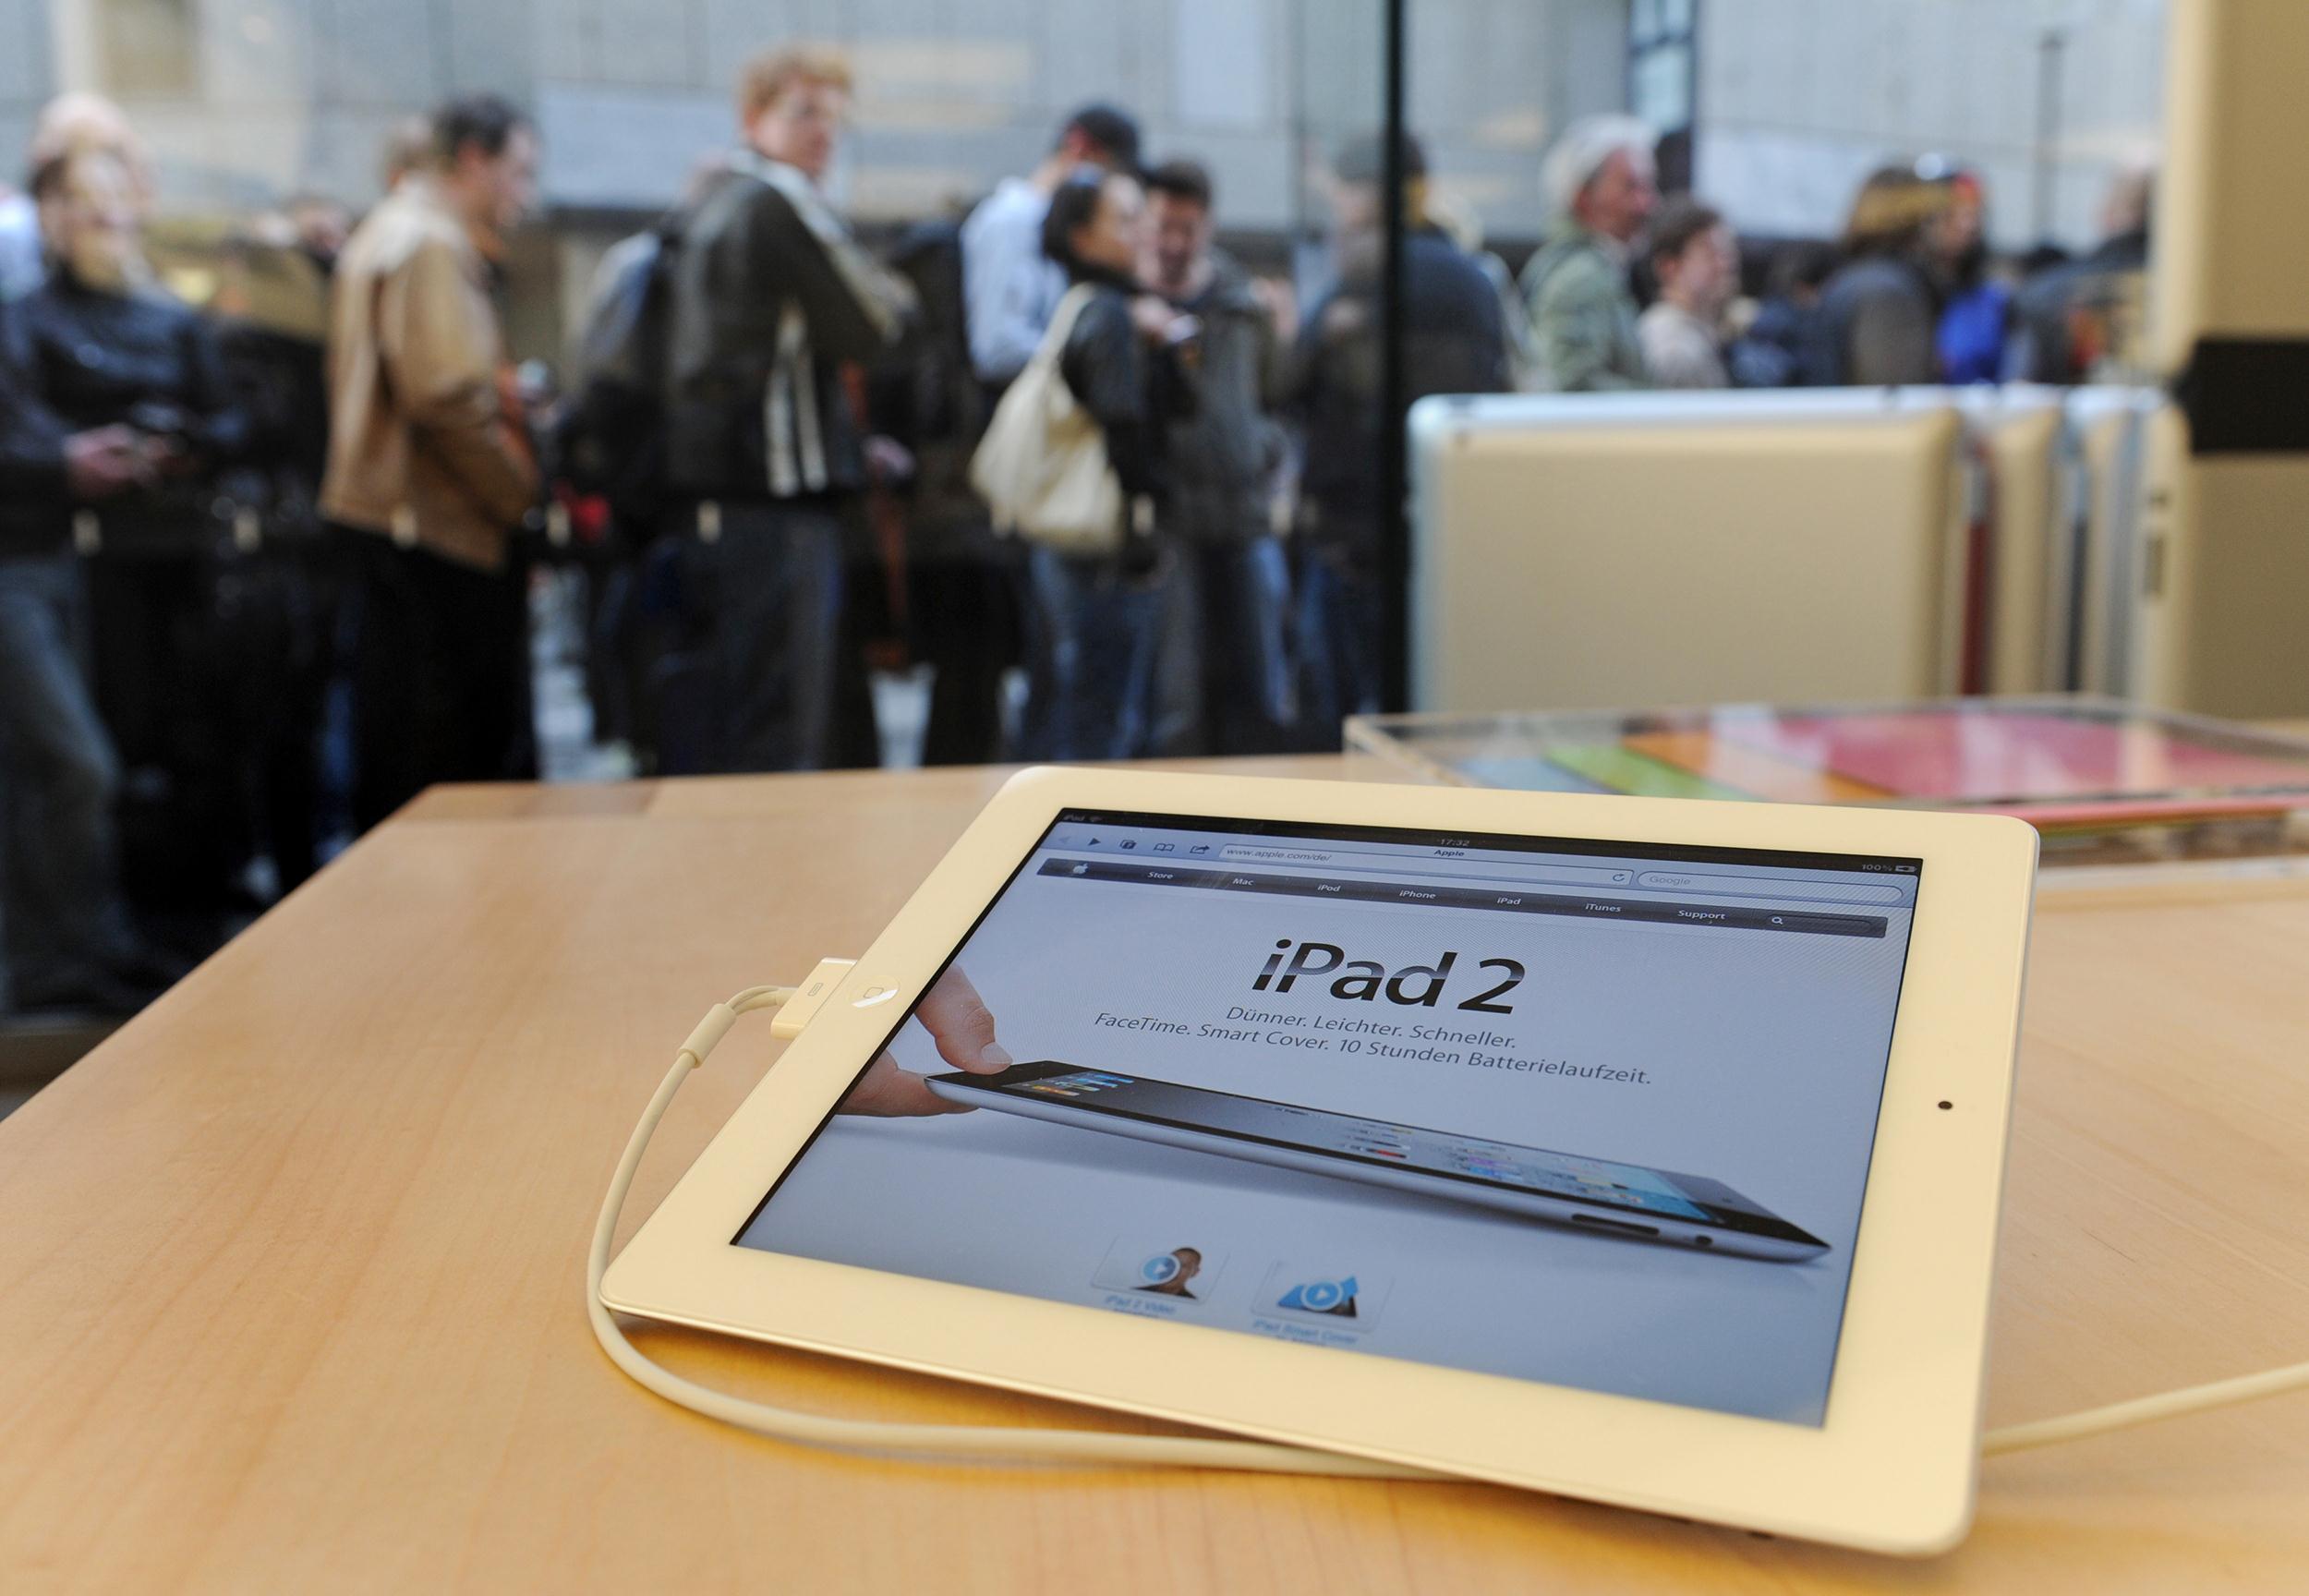 Customers wait to buy the new Apple iPad